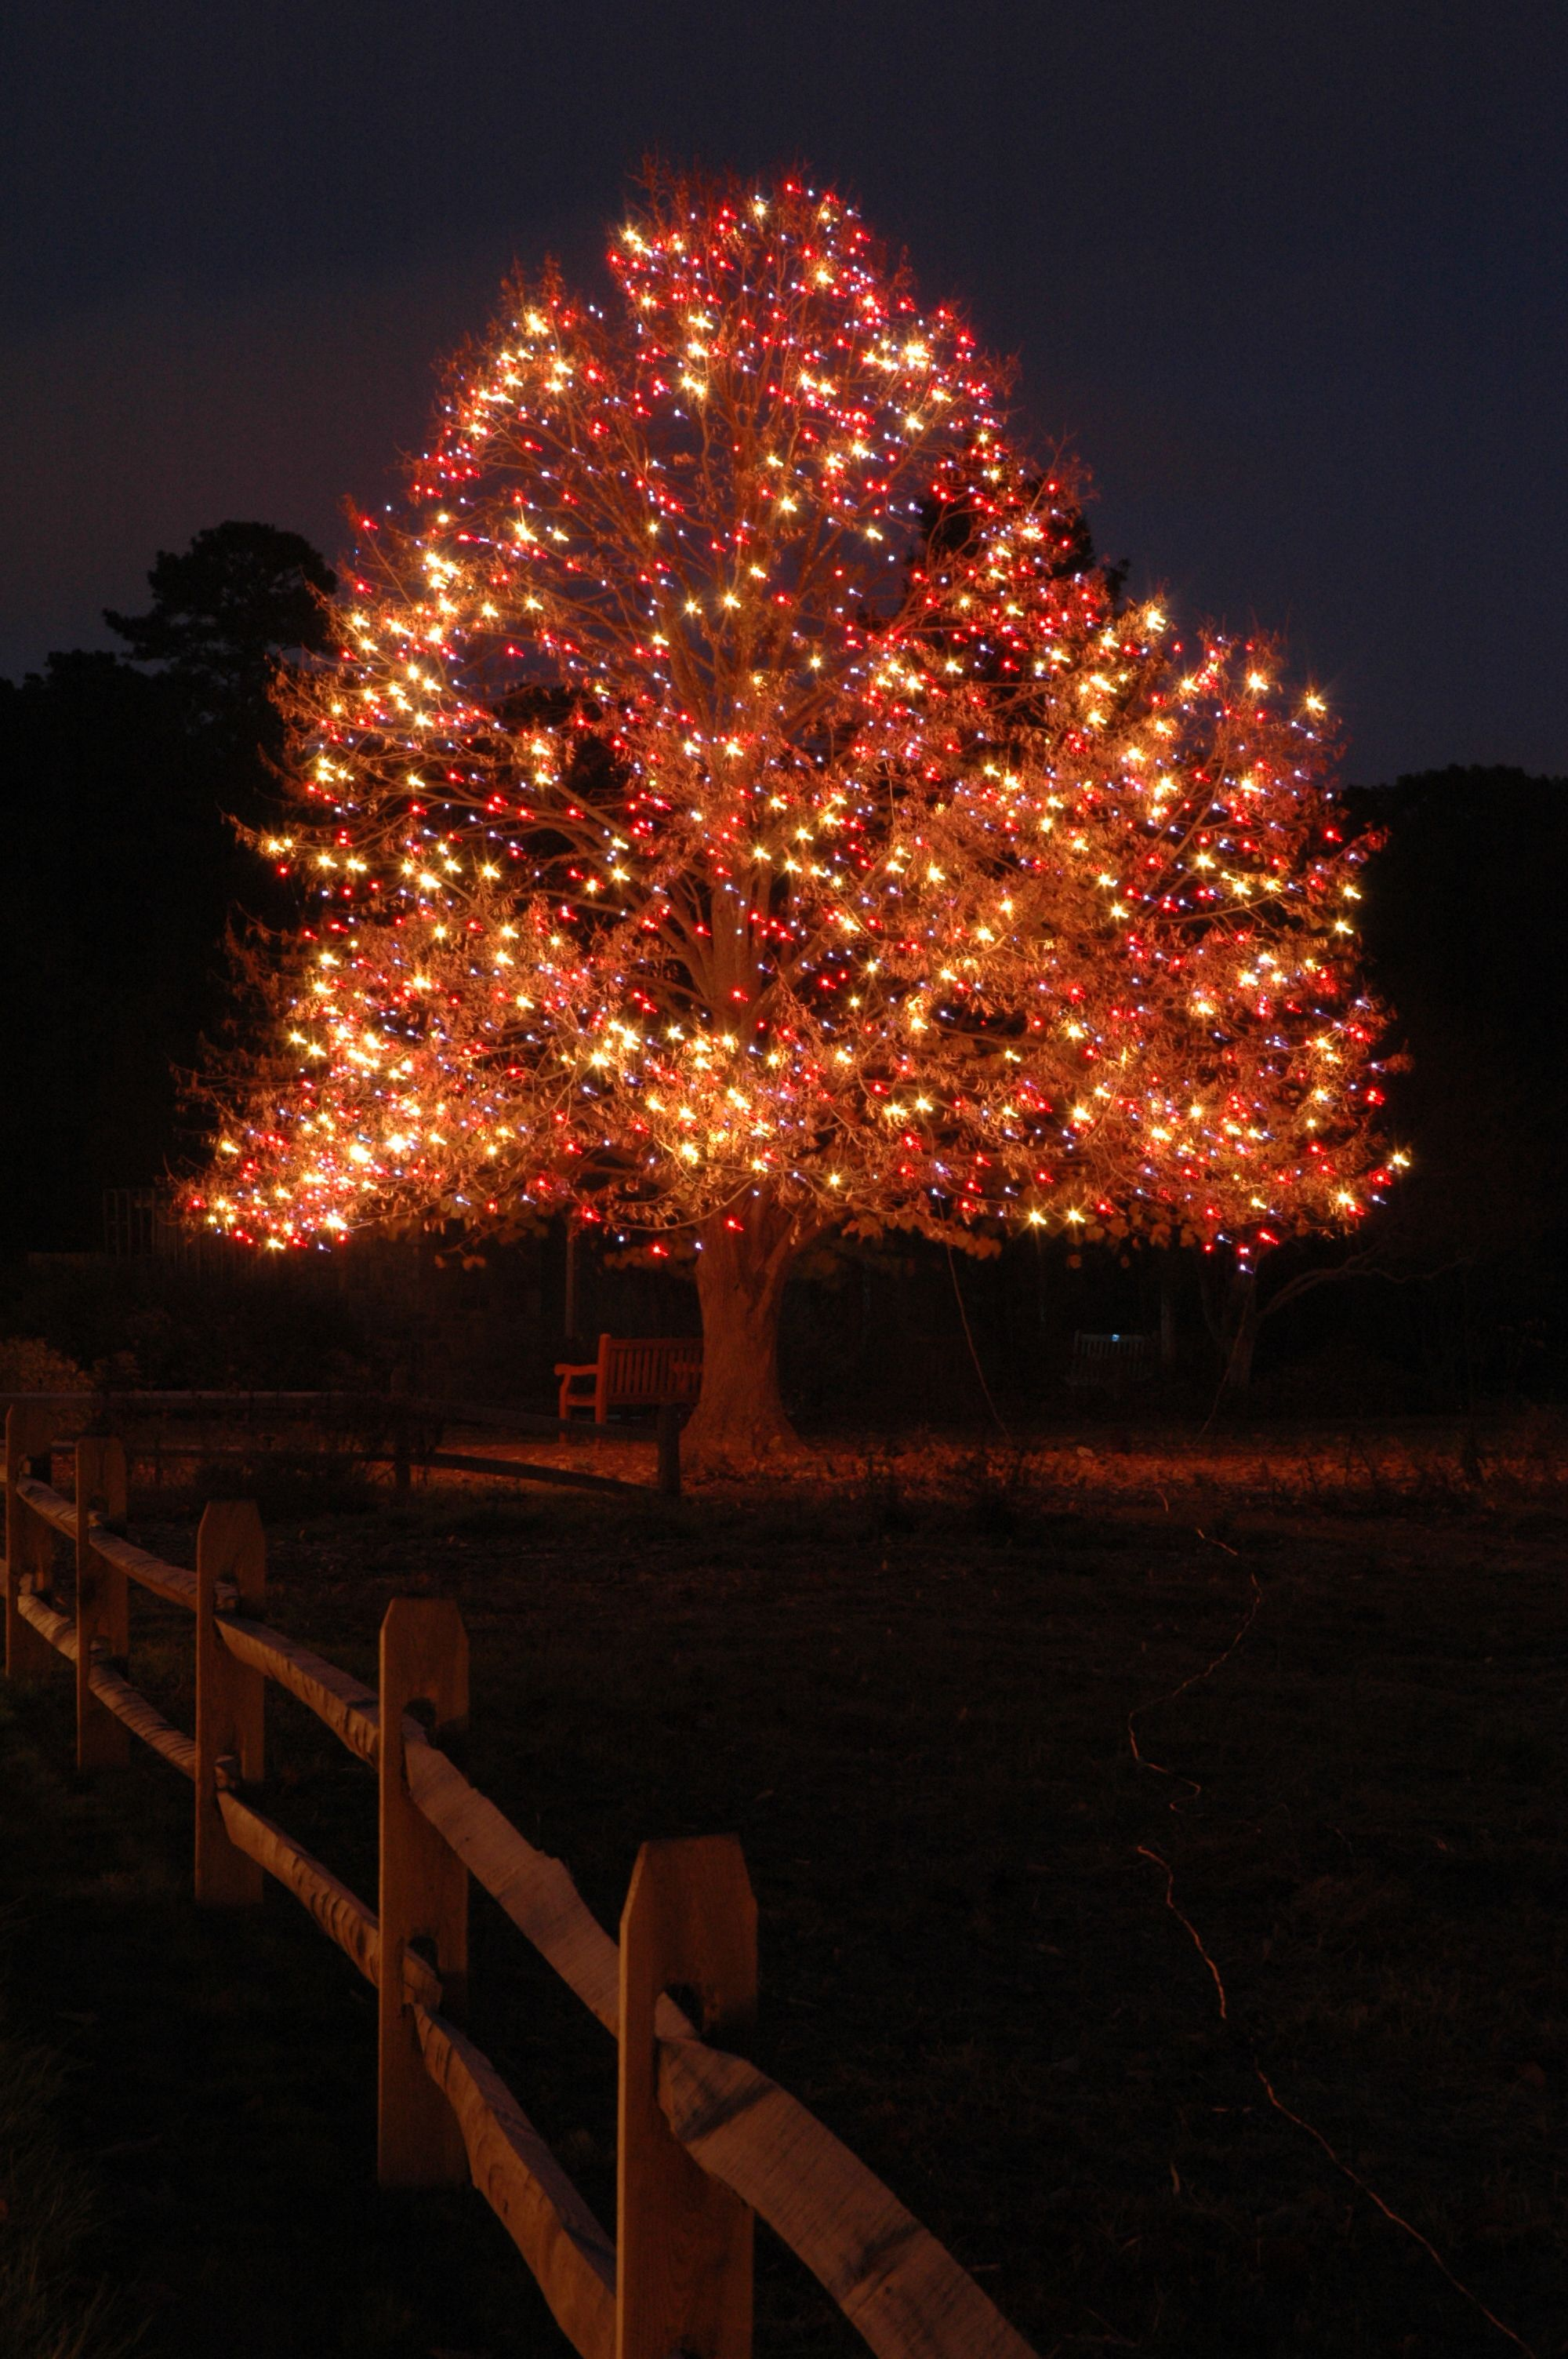 dominion garden of lights at the norfolk botanical garden